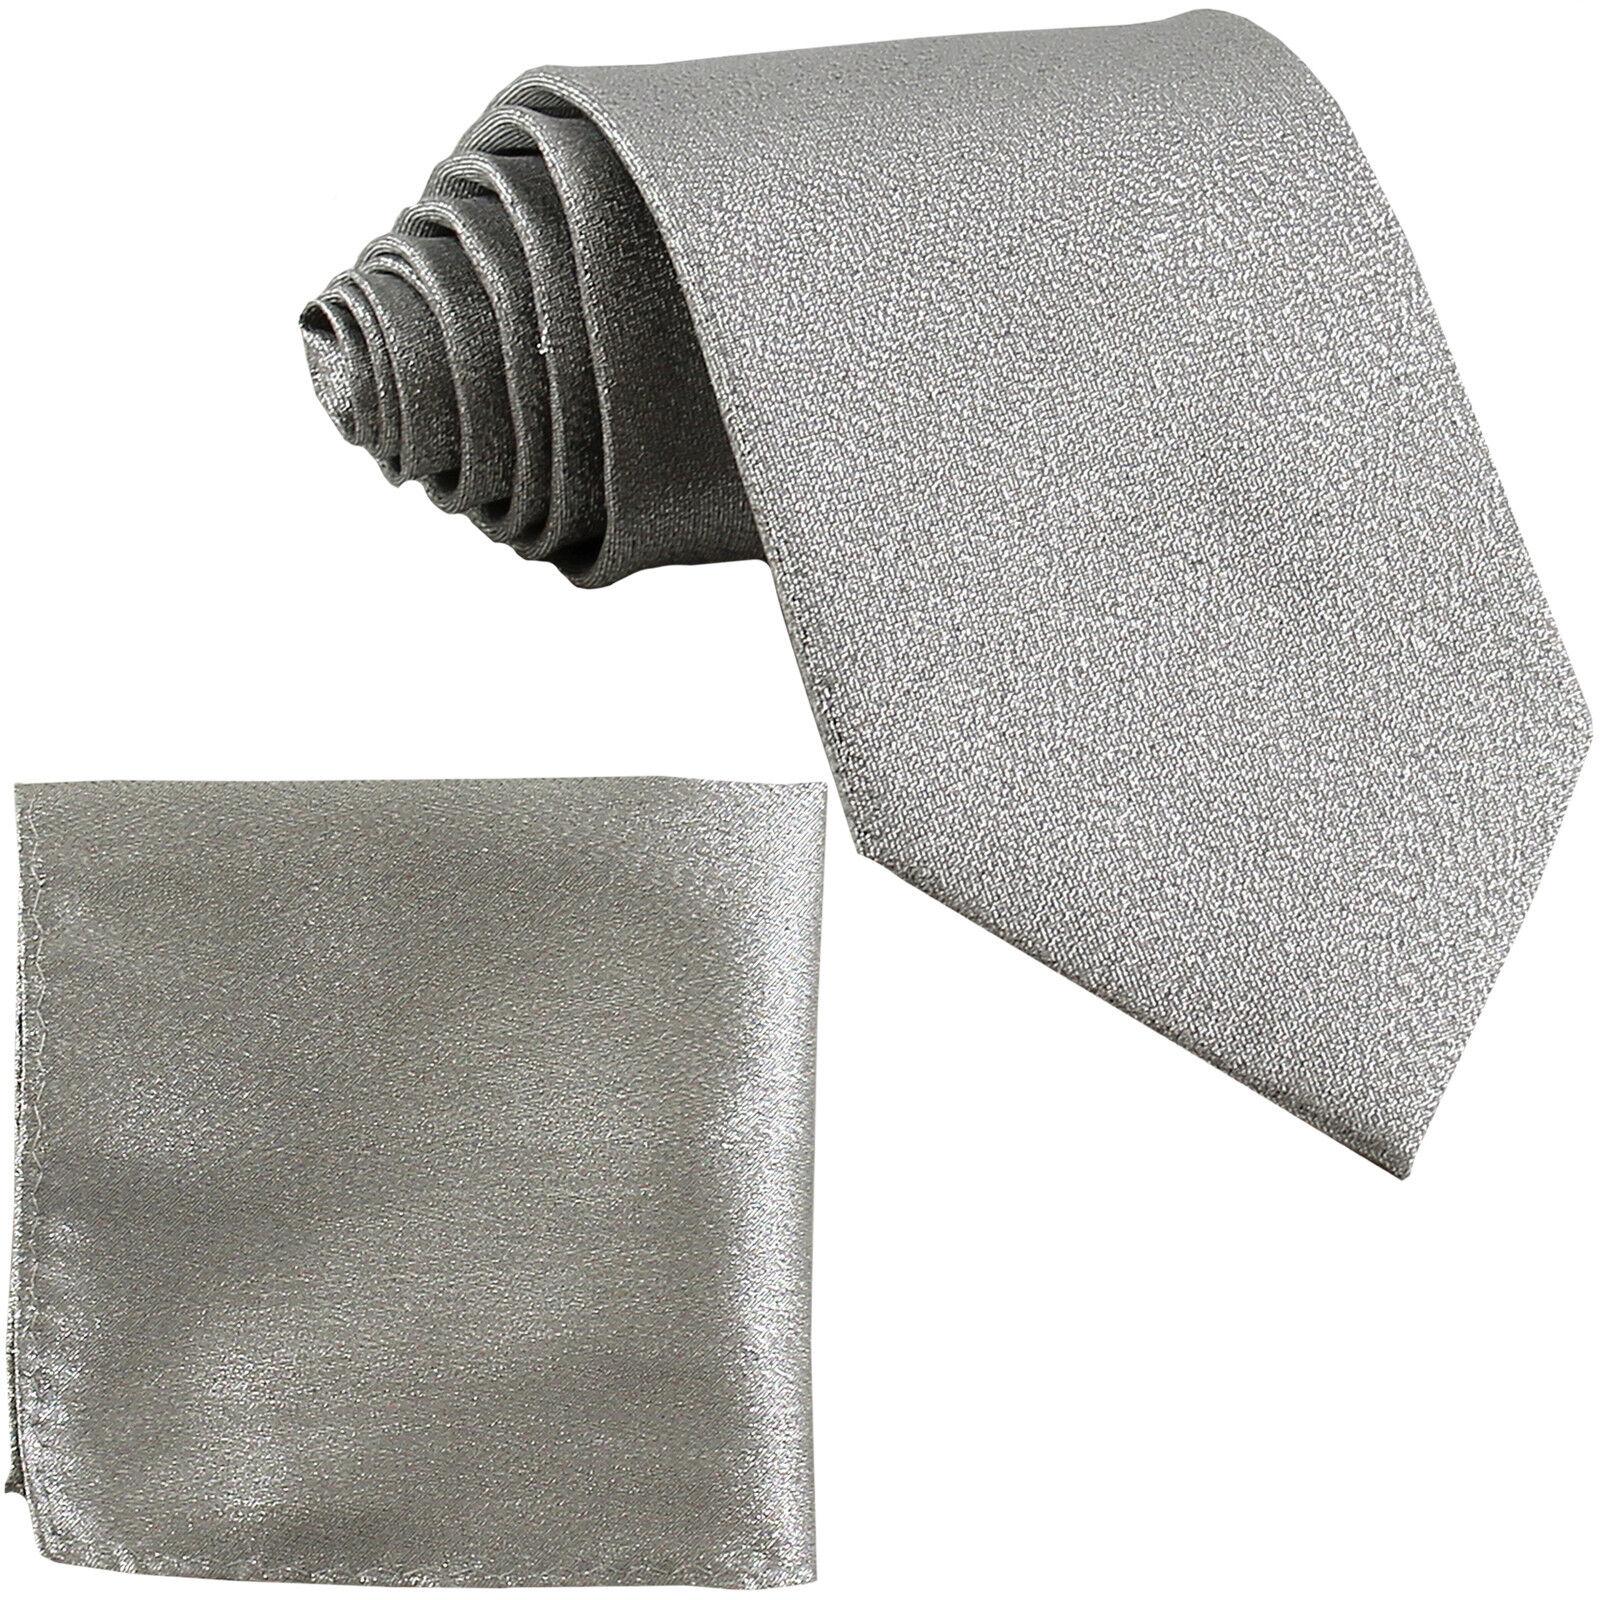 New Polyester Men/'s Neck Tie /& Pocket Square Hankie Set Shiny Finish red